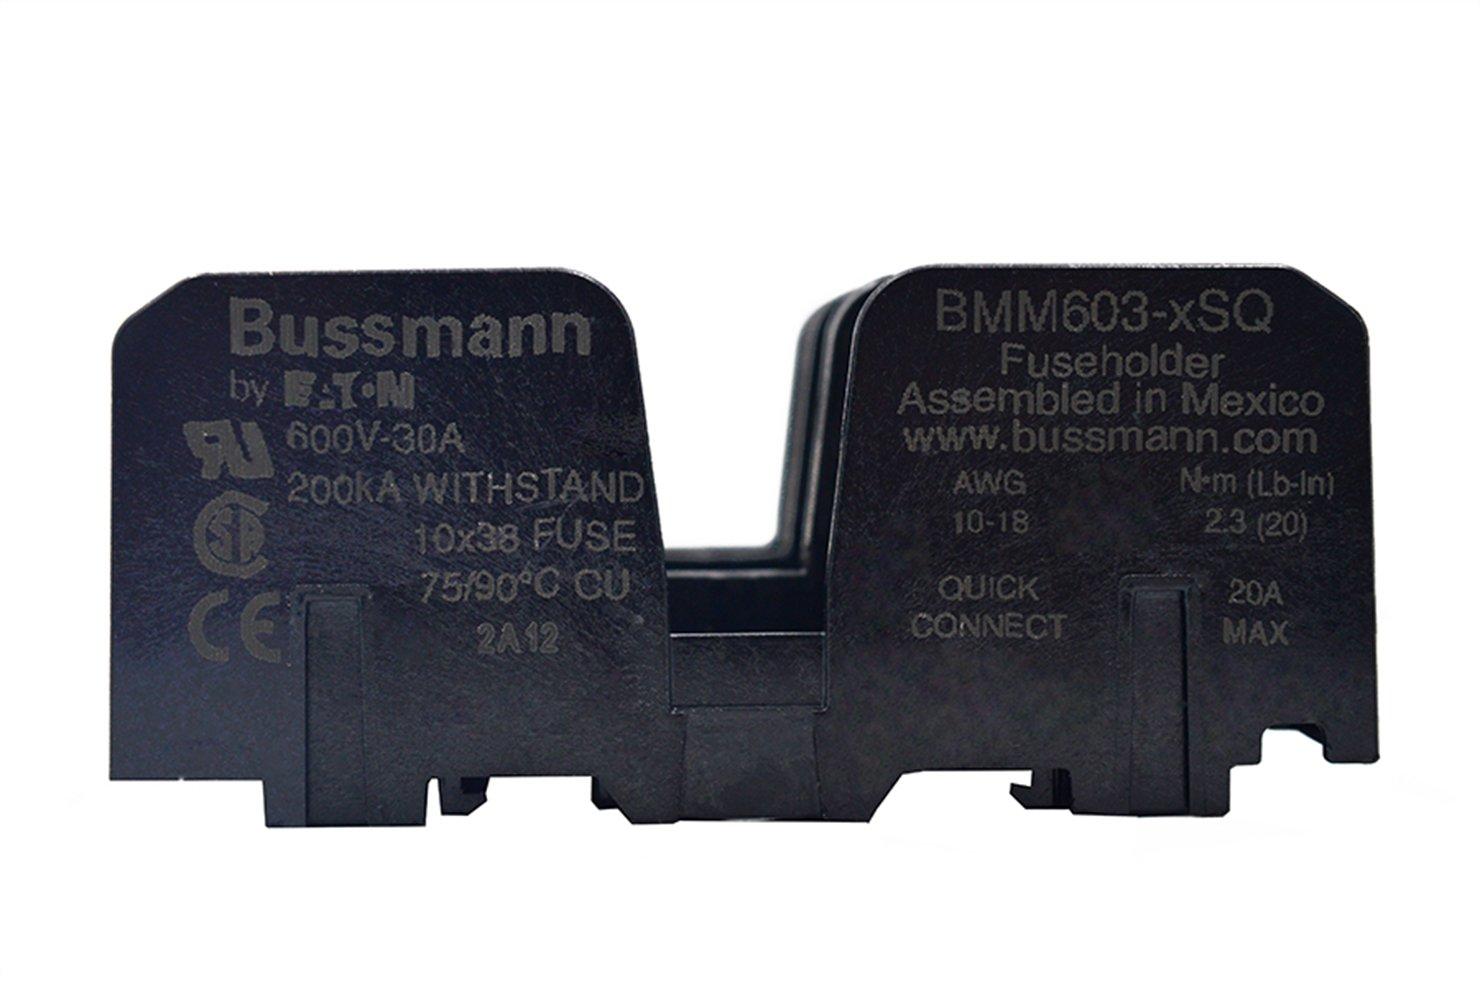 Buss Tcf30 Cubefuse Rk5 Fuse Holder In Box Cooper Bussmann Block A Pole Industrial Scientific 1480x1000